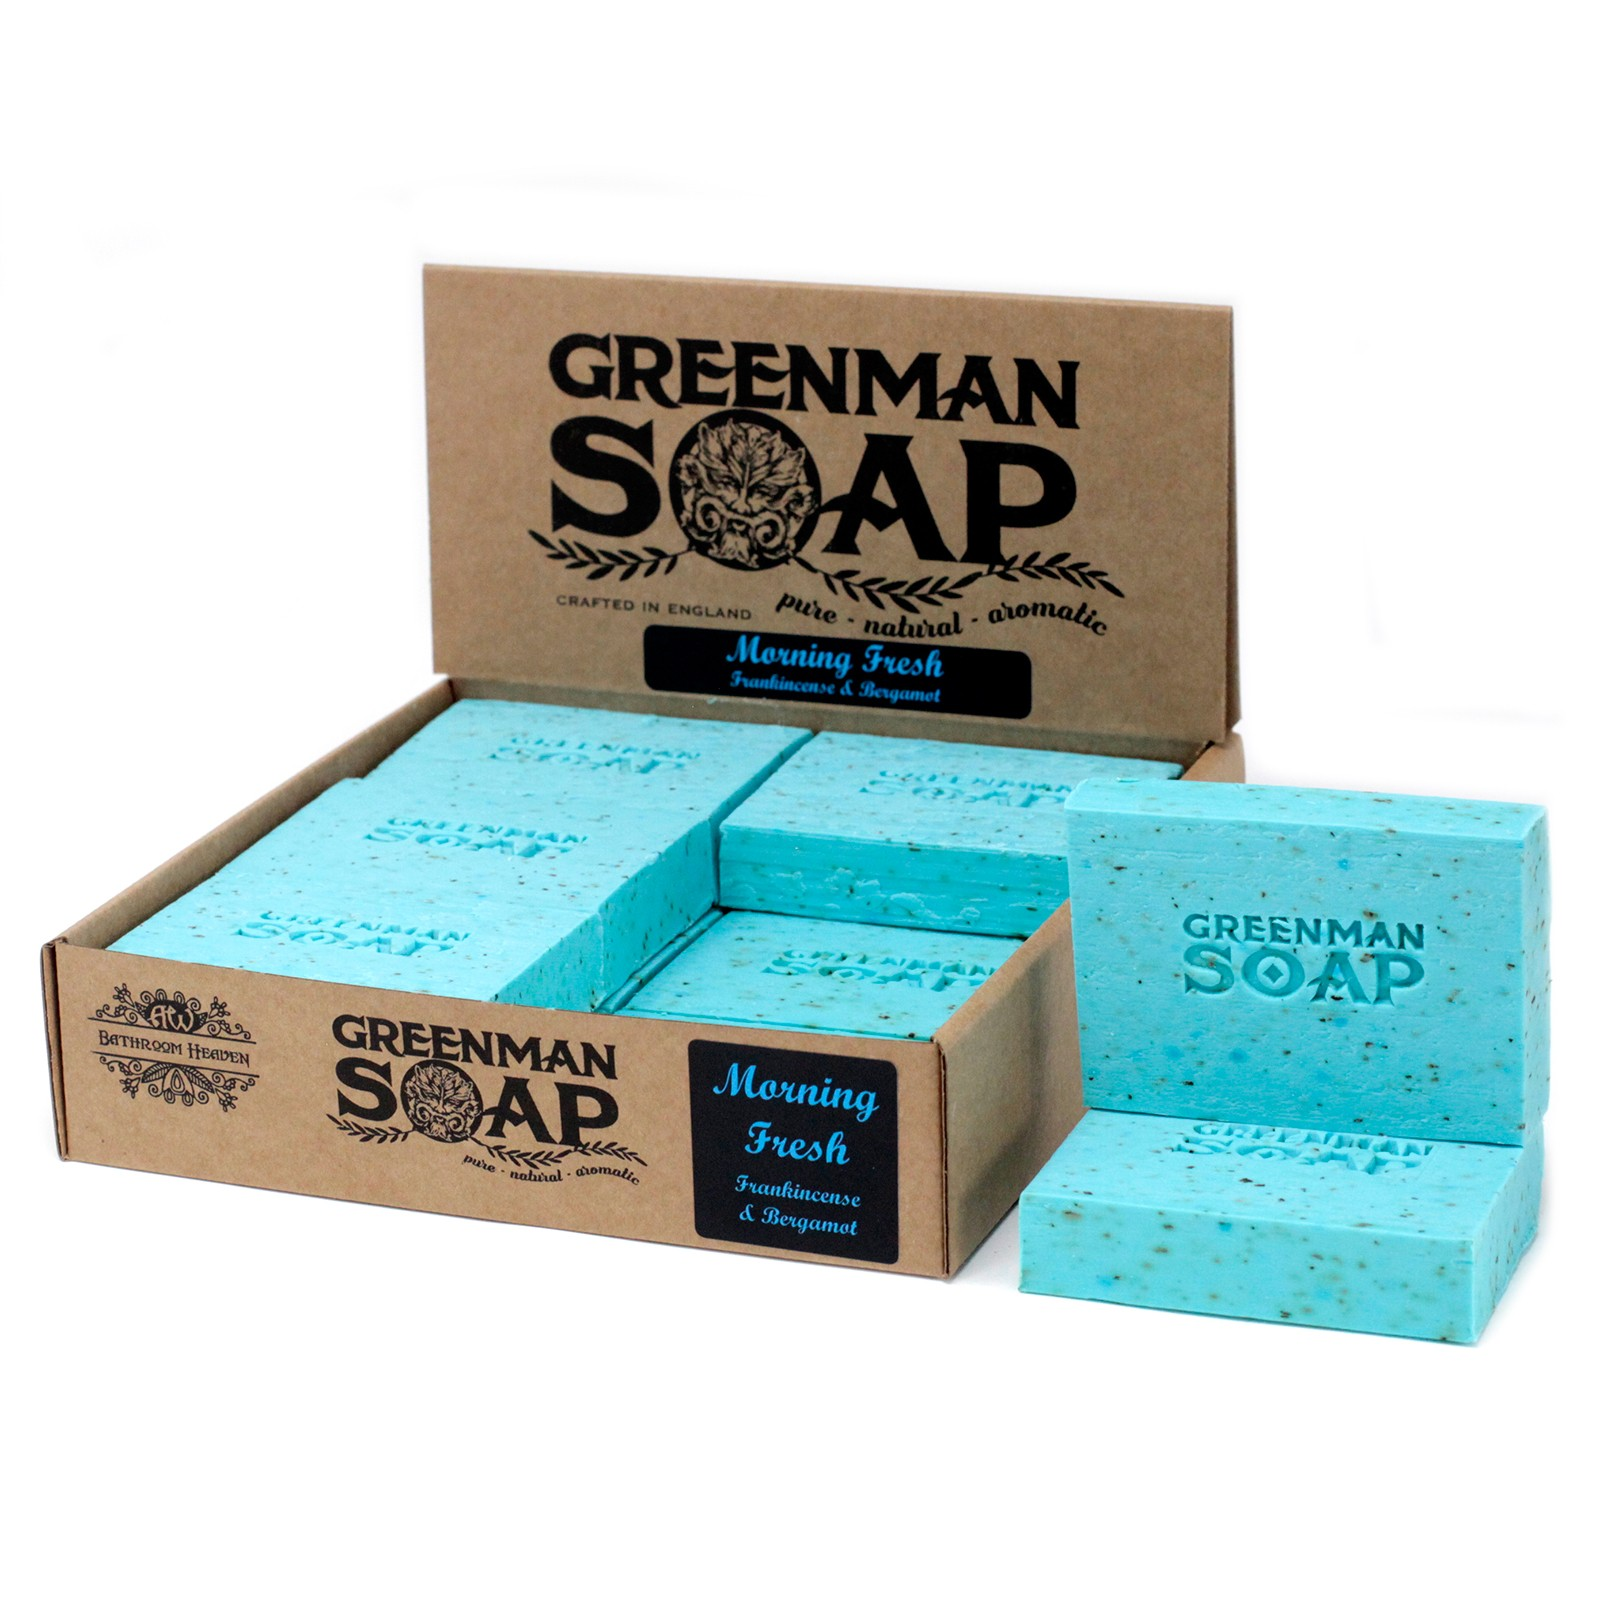 Greenman Soap 100g - Morning Fresh